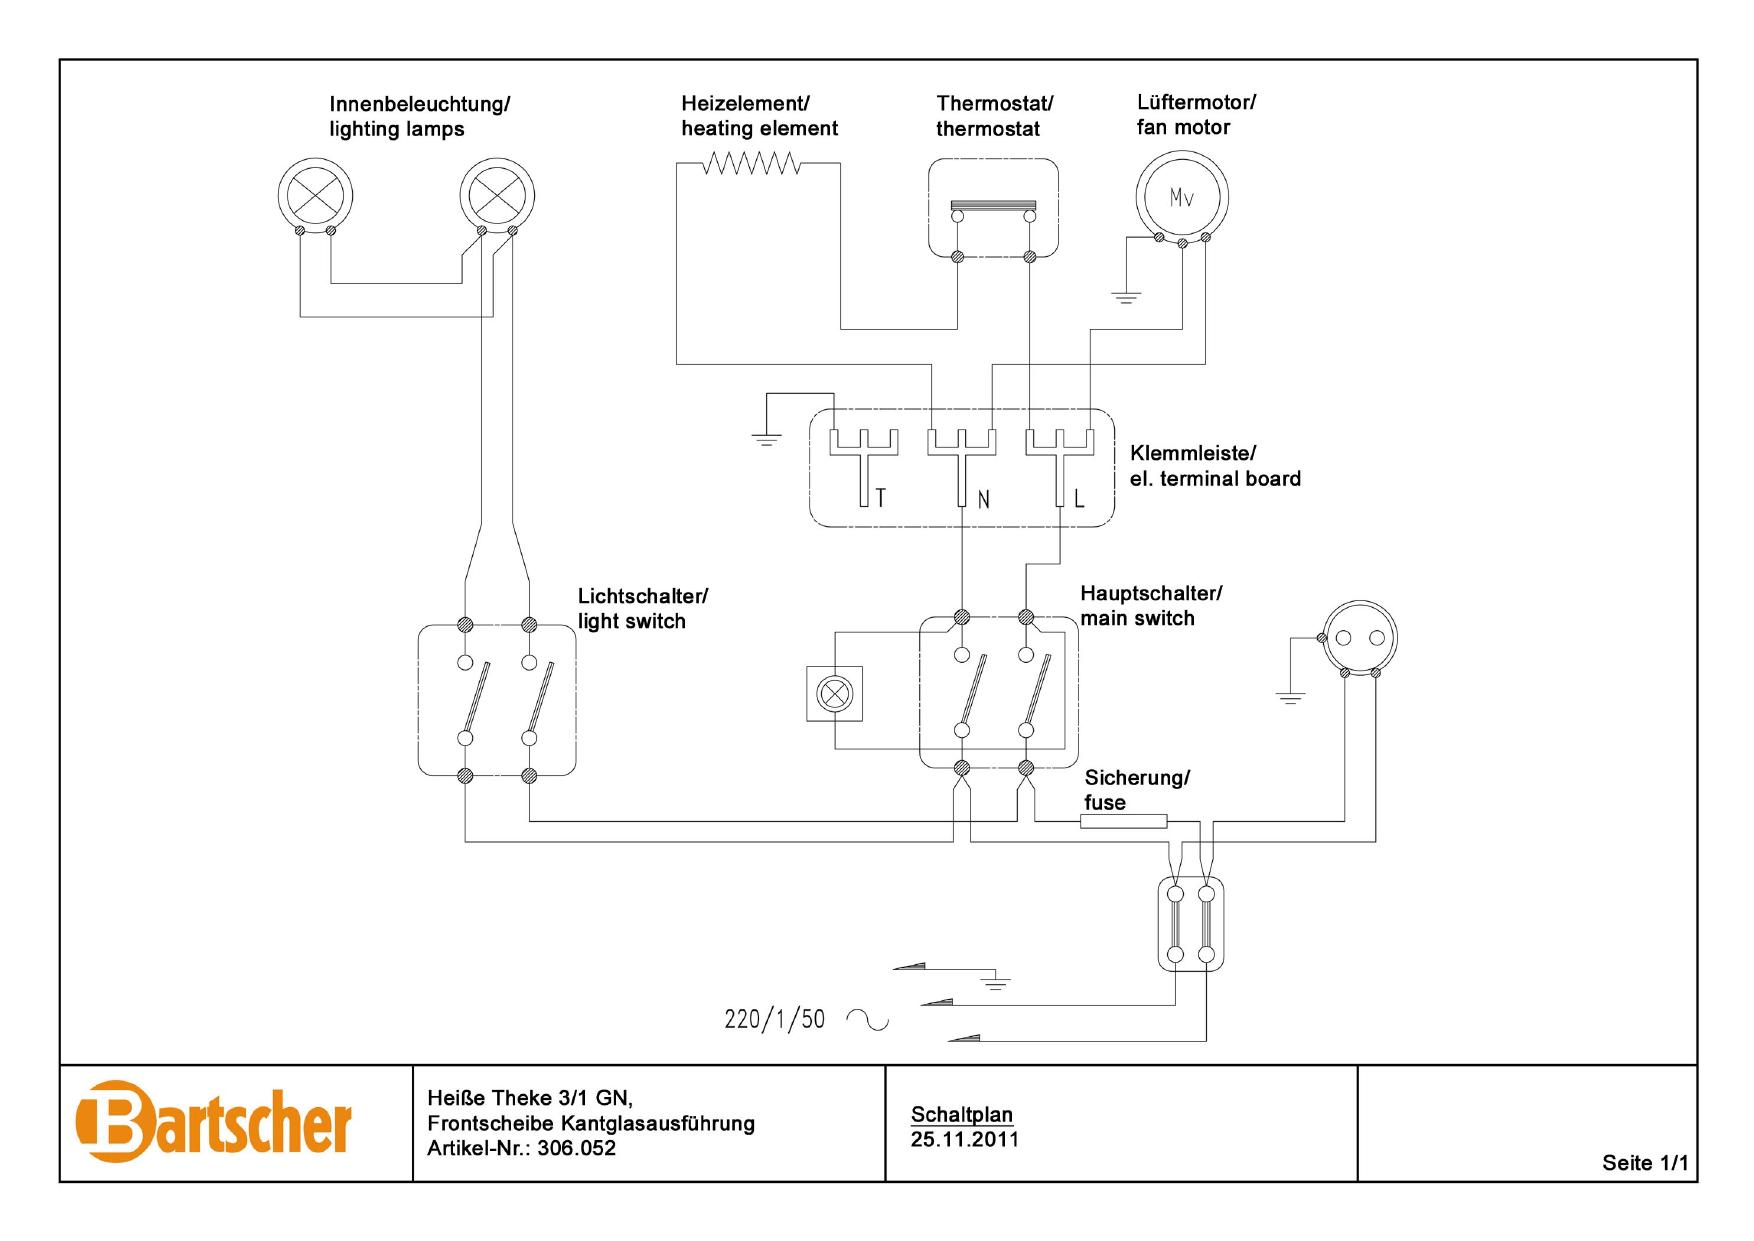 Diagram Break Glass Unit Wiring Diagram Full Version Hd Quality Wiring Diagram Diagramkalynd Itccalvinotp It